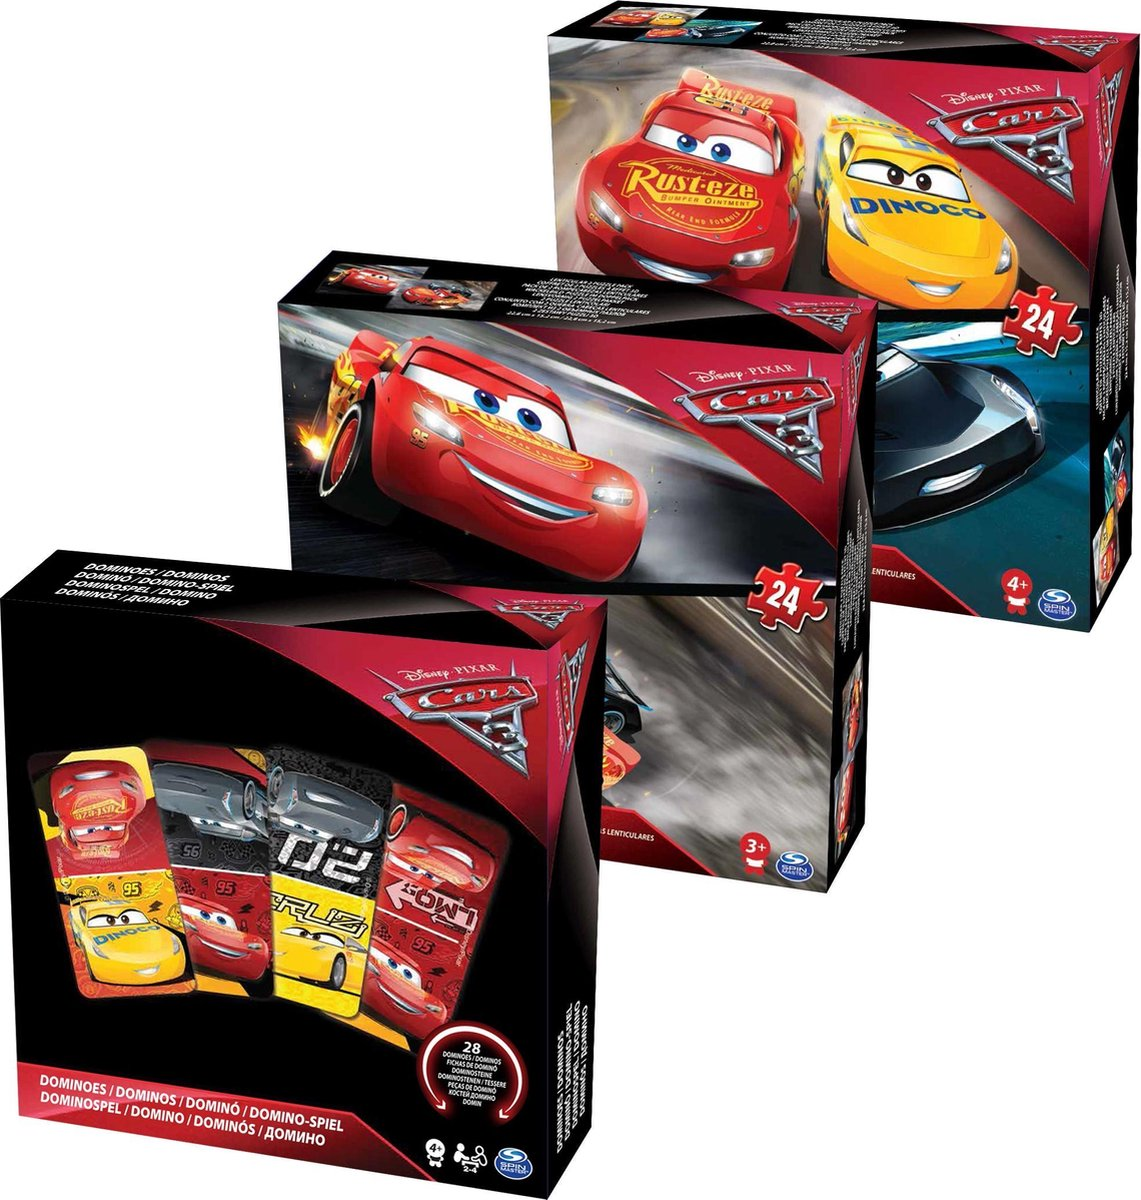 Cars 3 - Games Bundle